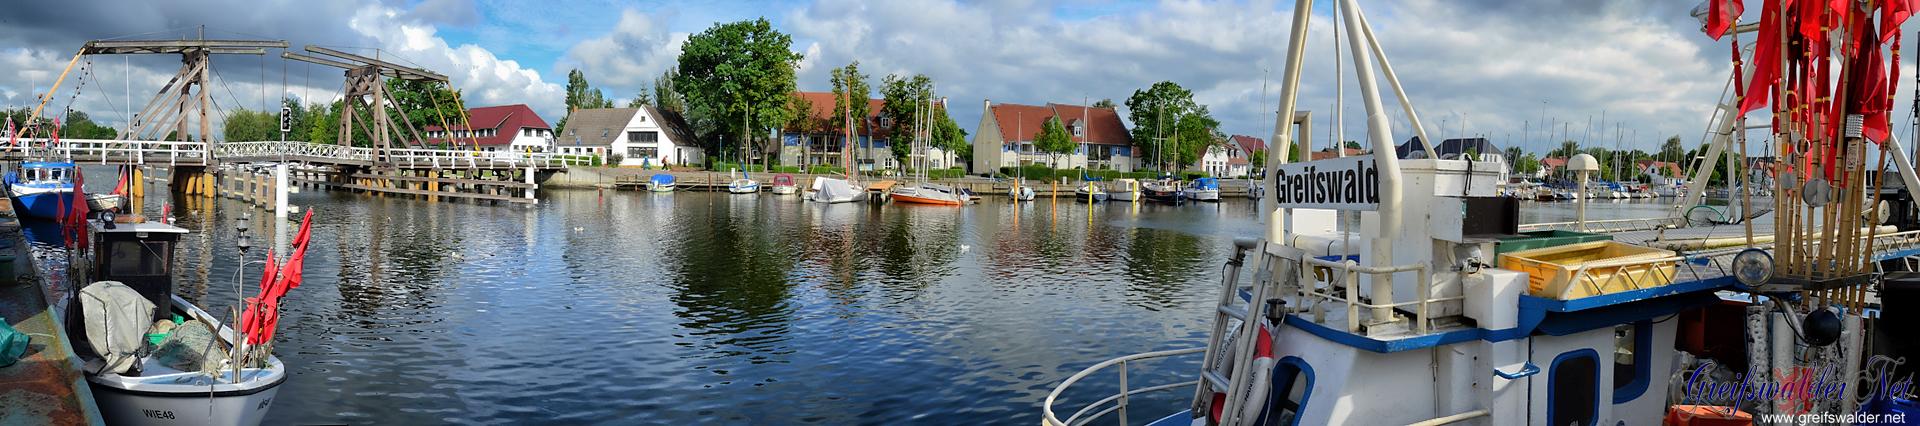 Panorama Hafen Greifswald-Wieck